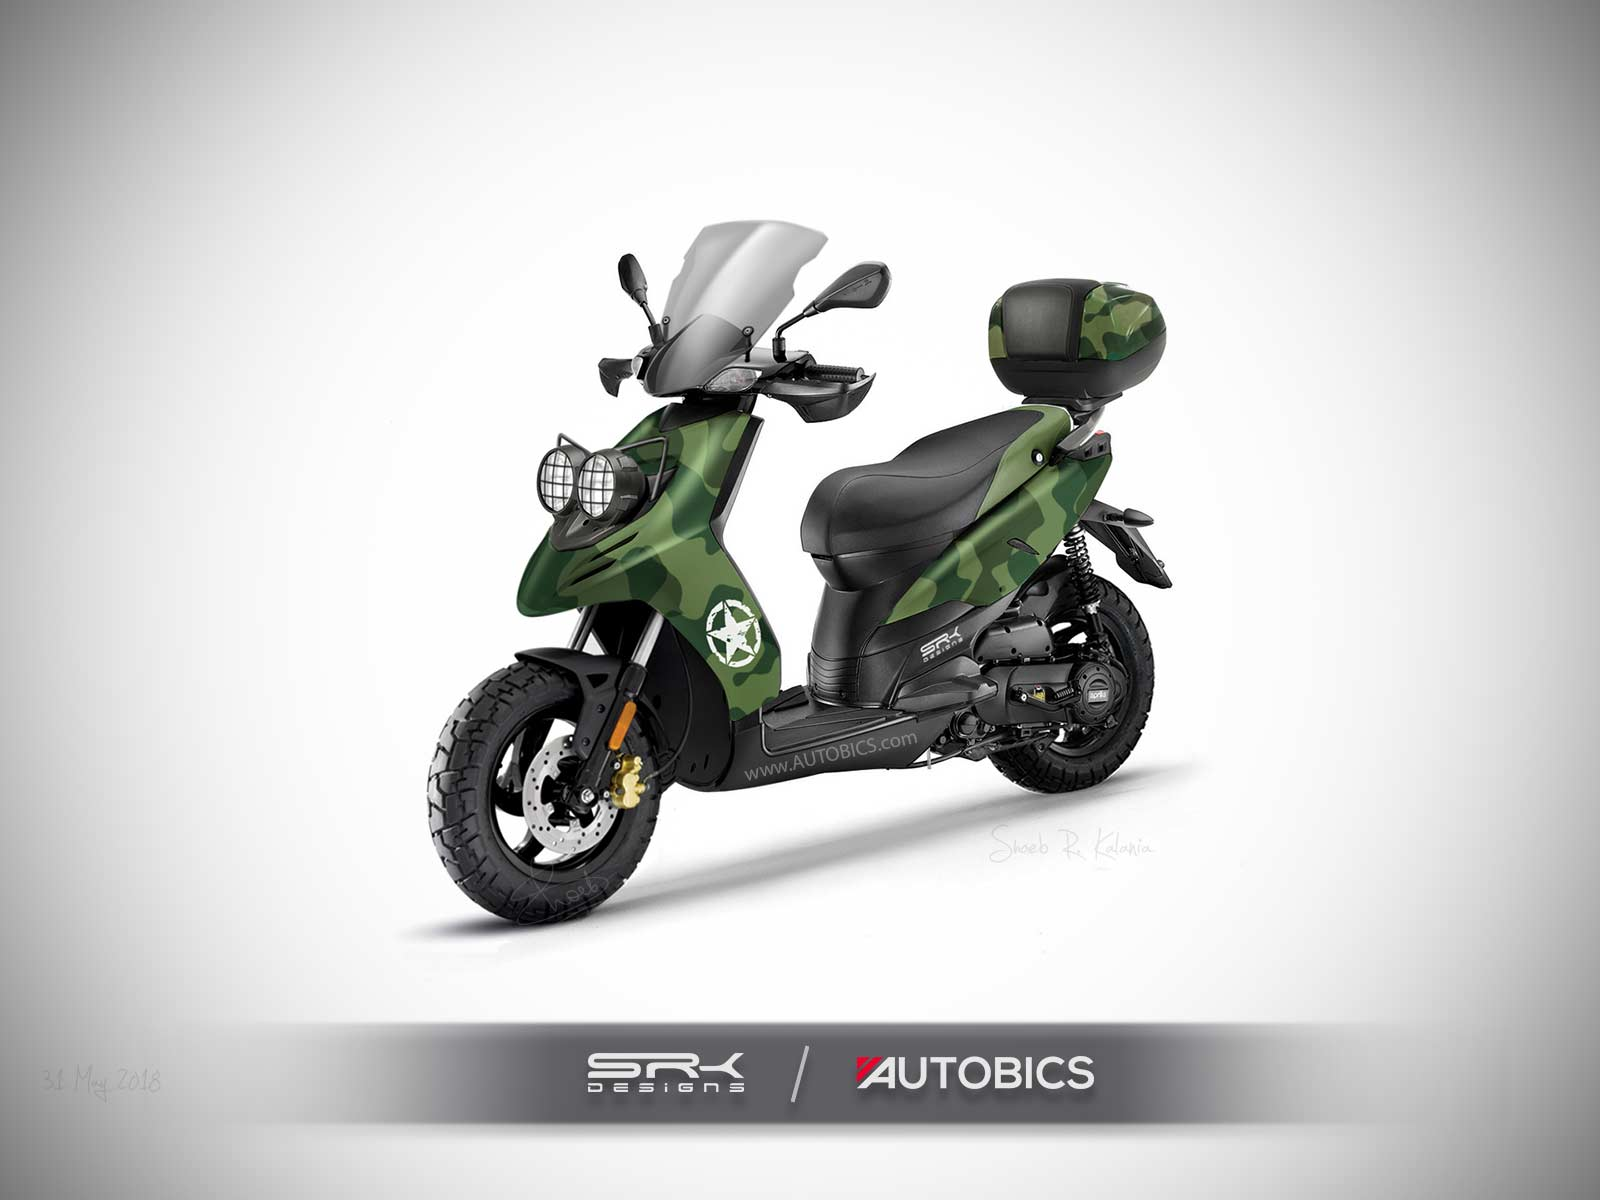 aprilia sr 125 adventure scooter imagined rendering autobics. Black Bedroom Furniture Sets. Home Design Ideas